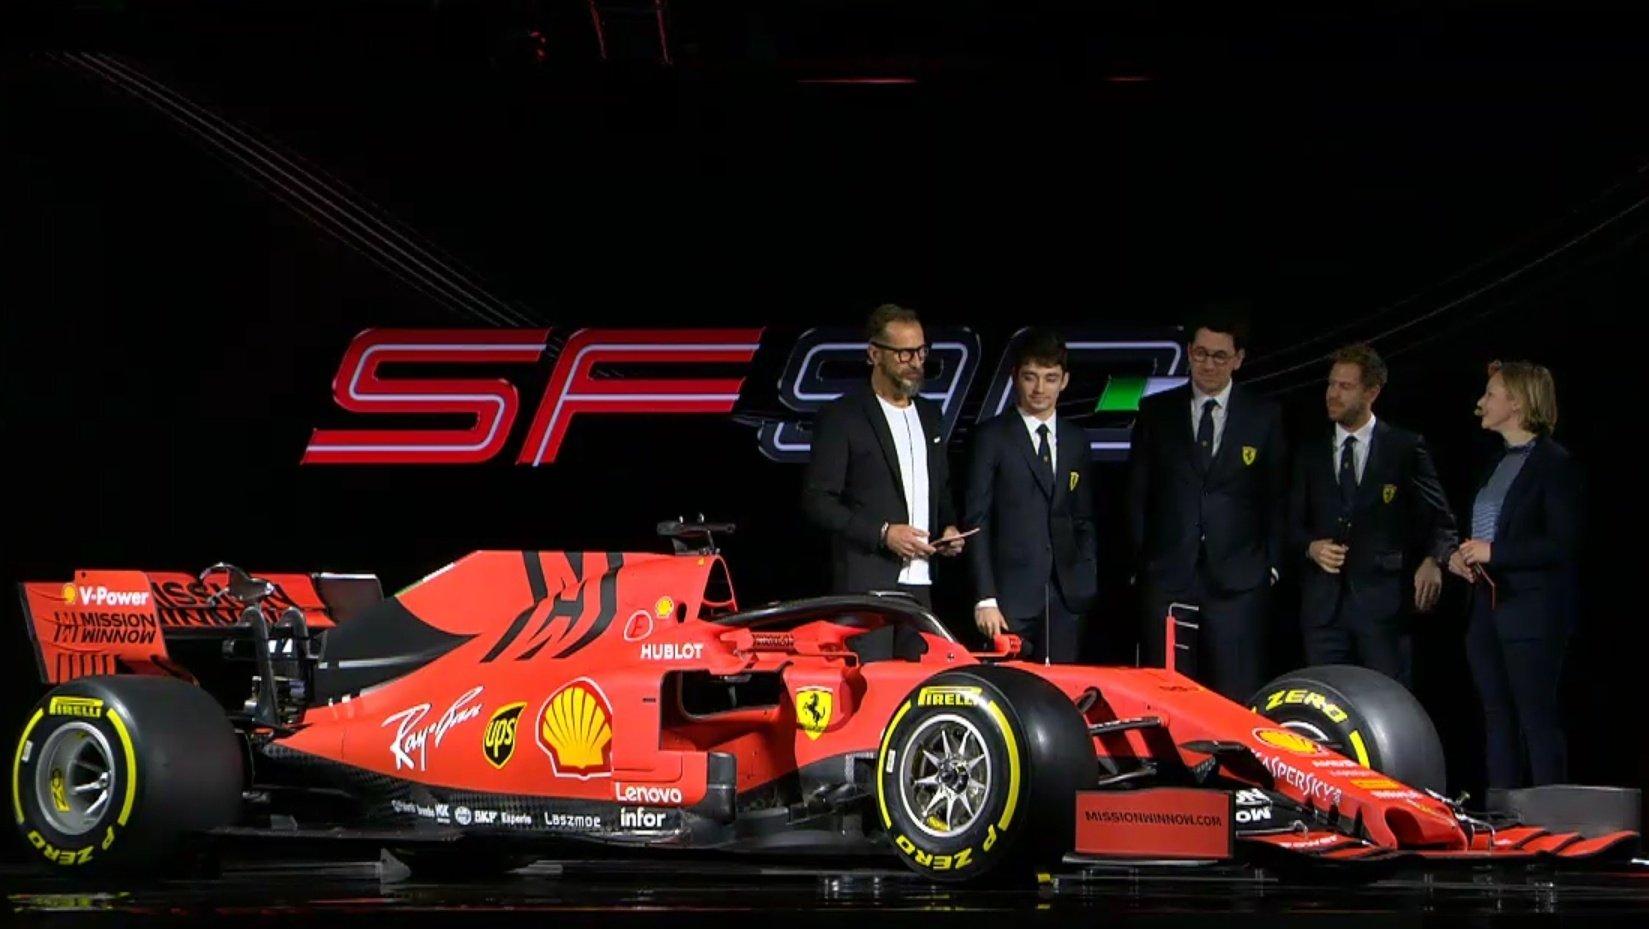 Nuova ferrari 2019 formula 1